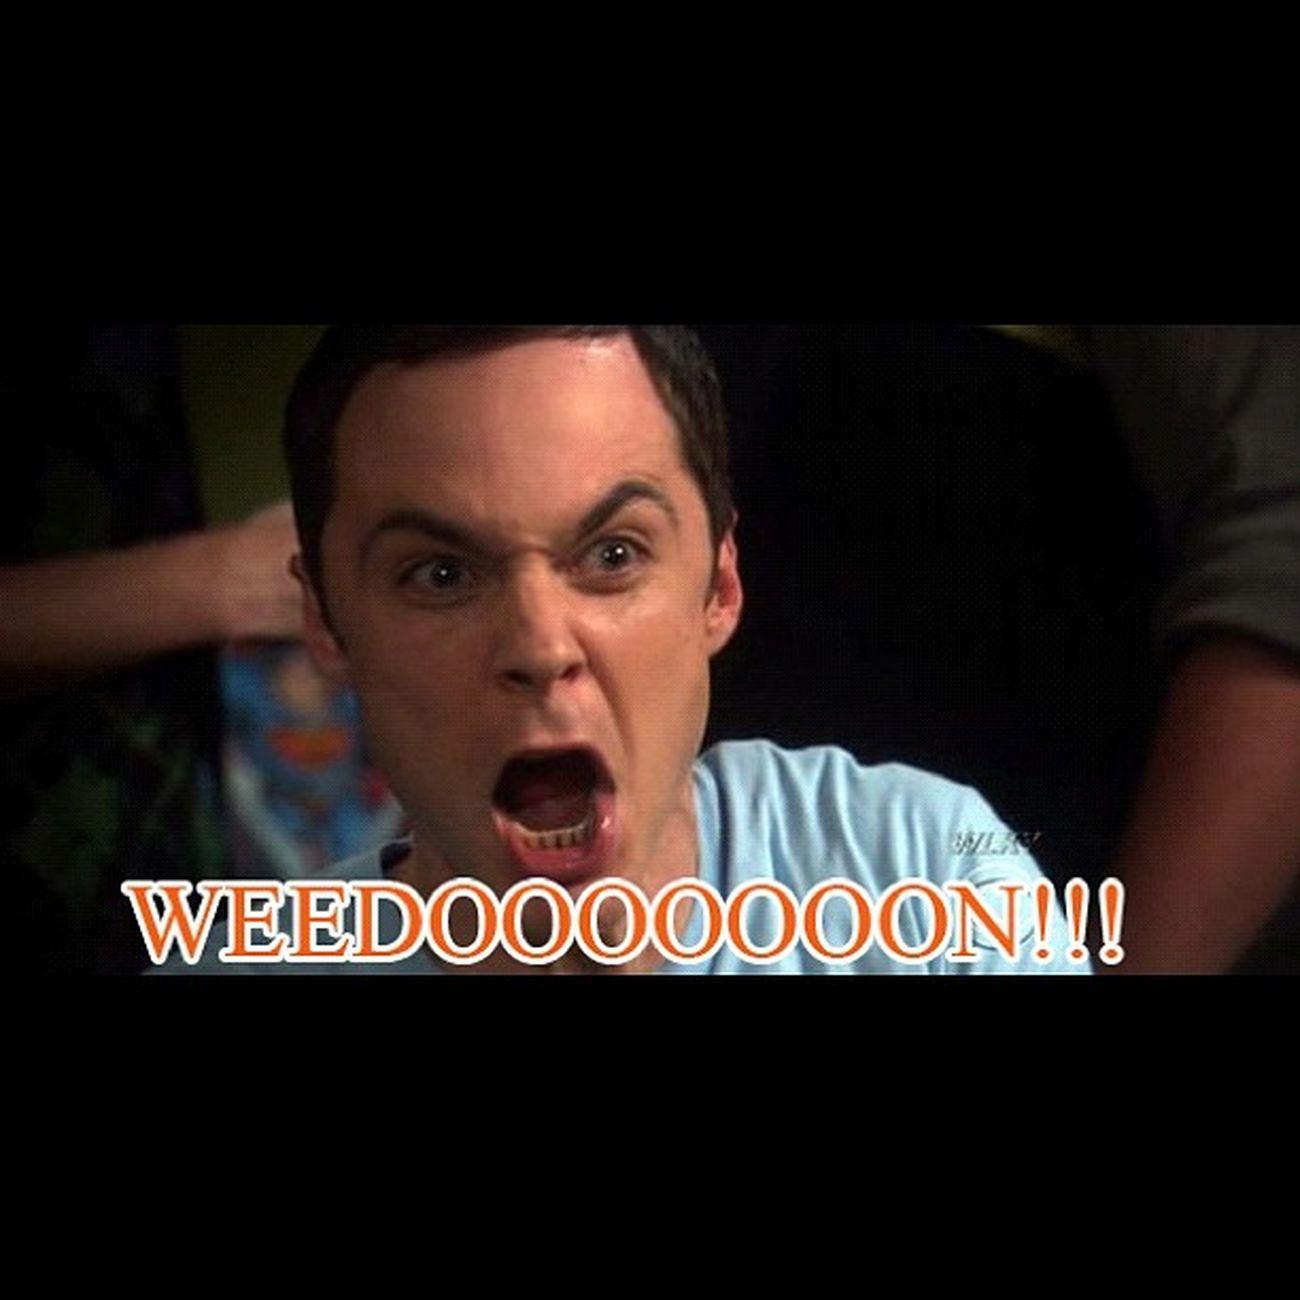 Sheldon's response to Browns drafting Brandonweeden